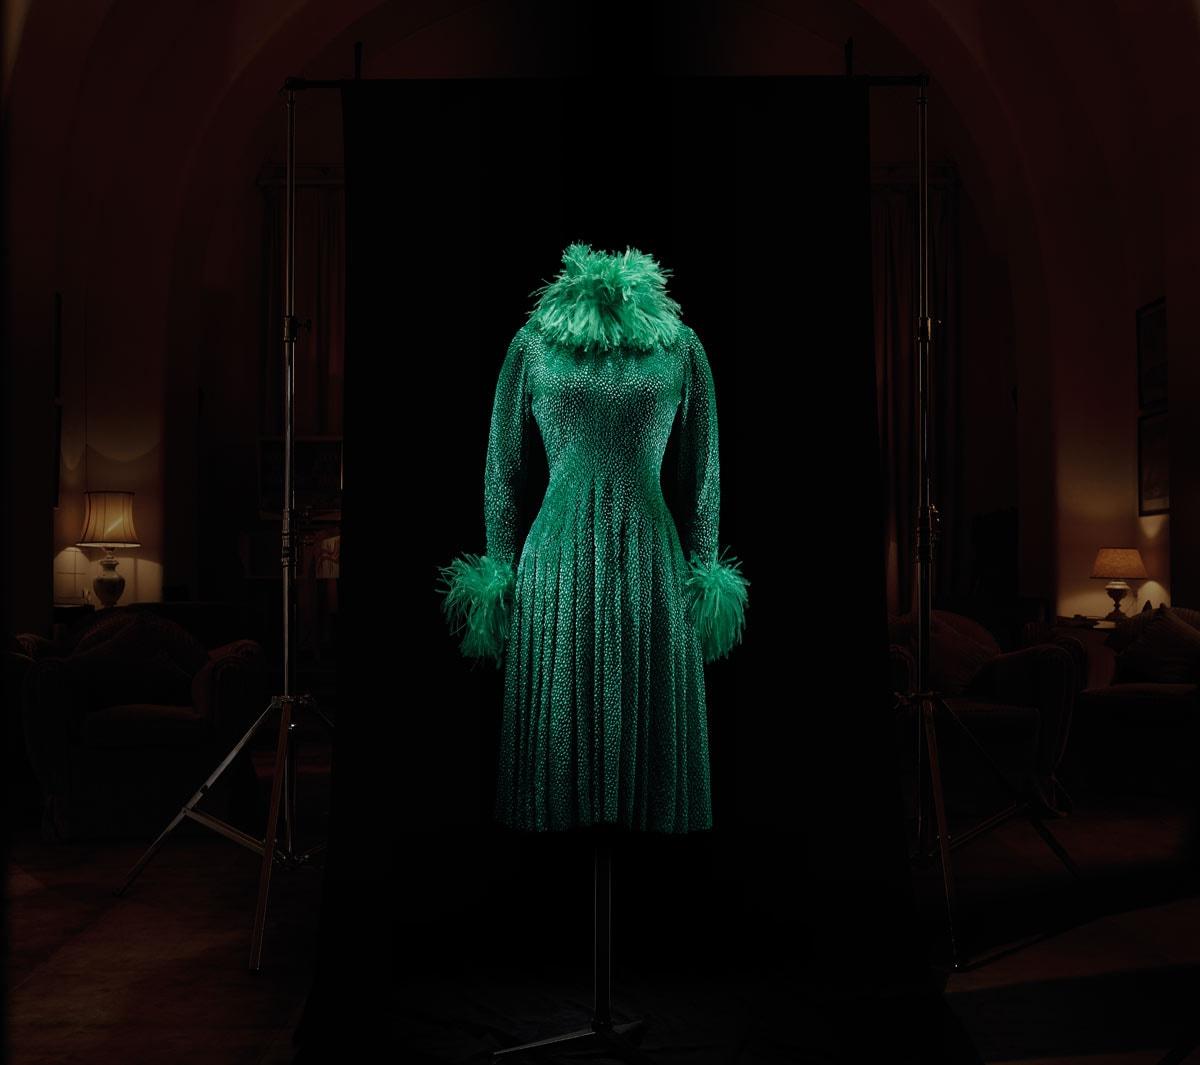 Christian Dior Museum wijdt tentoonstelling aan Grace Kelly